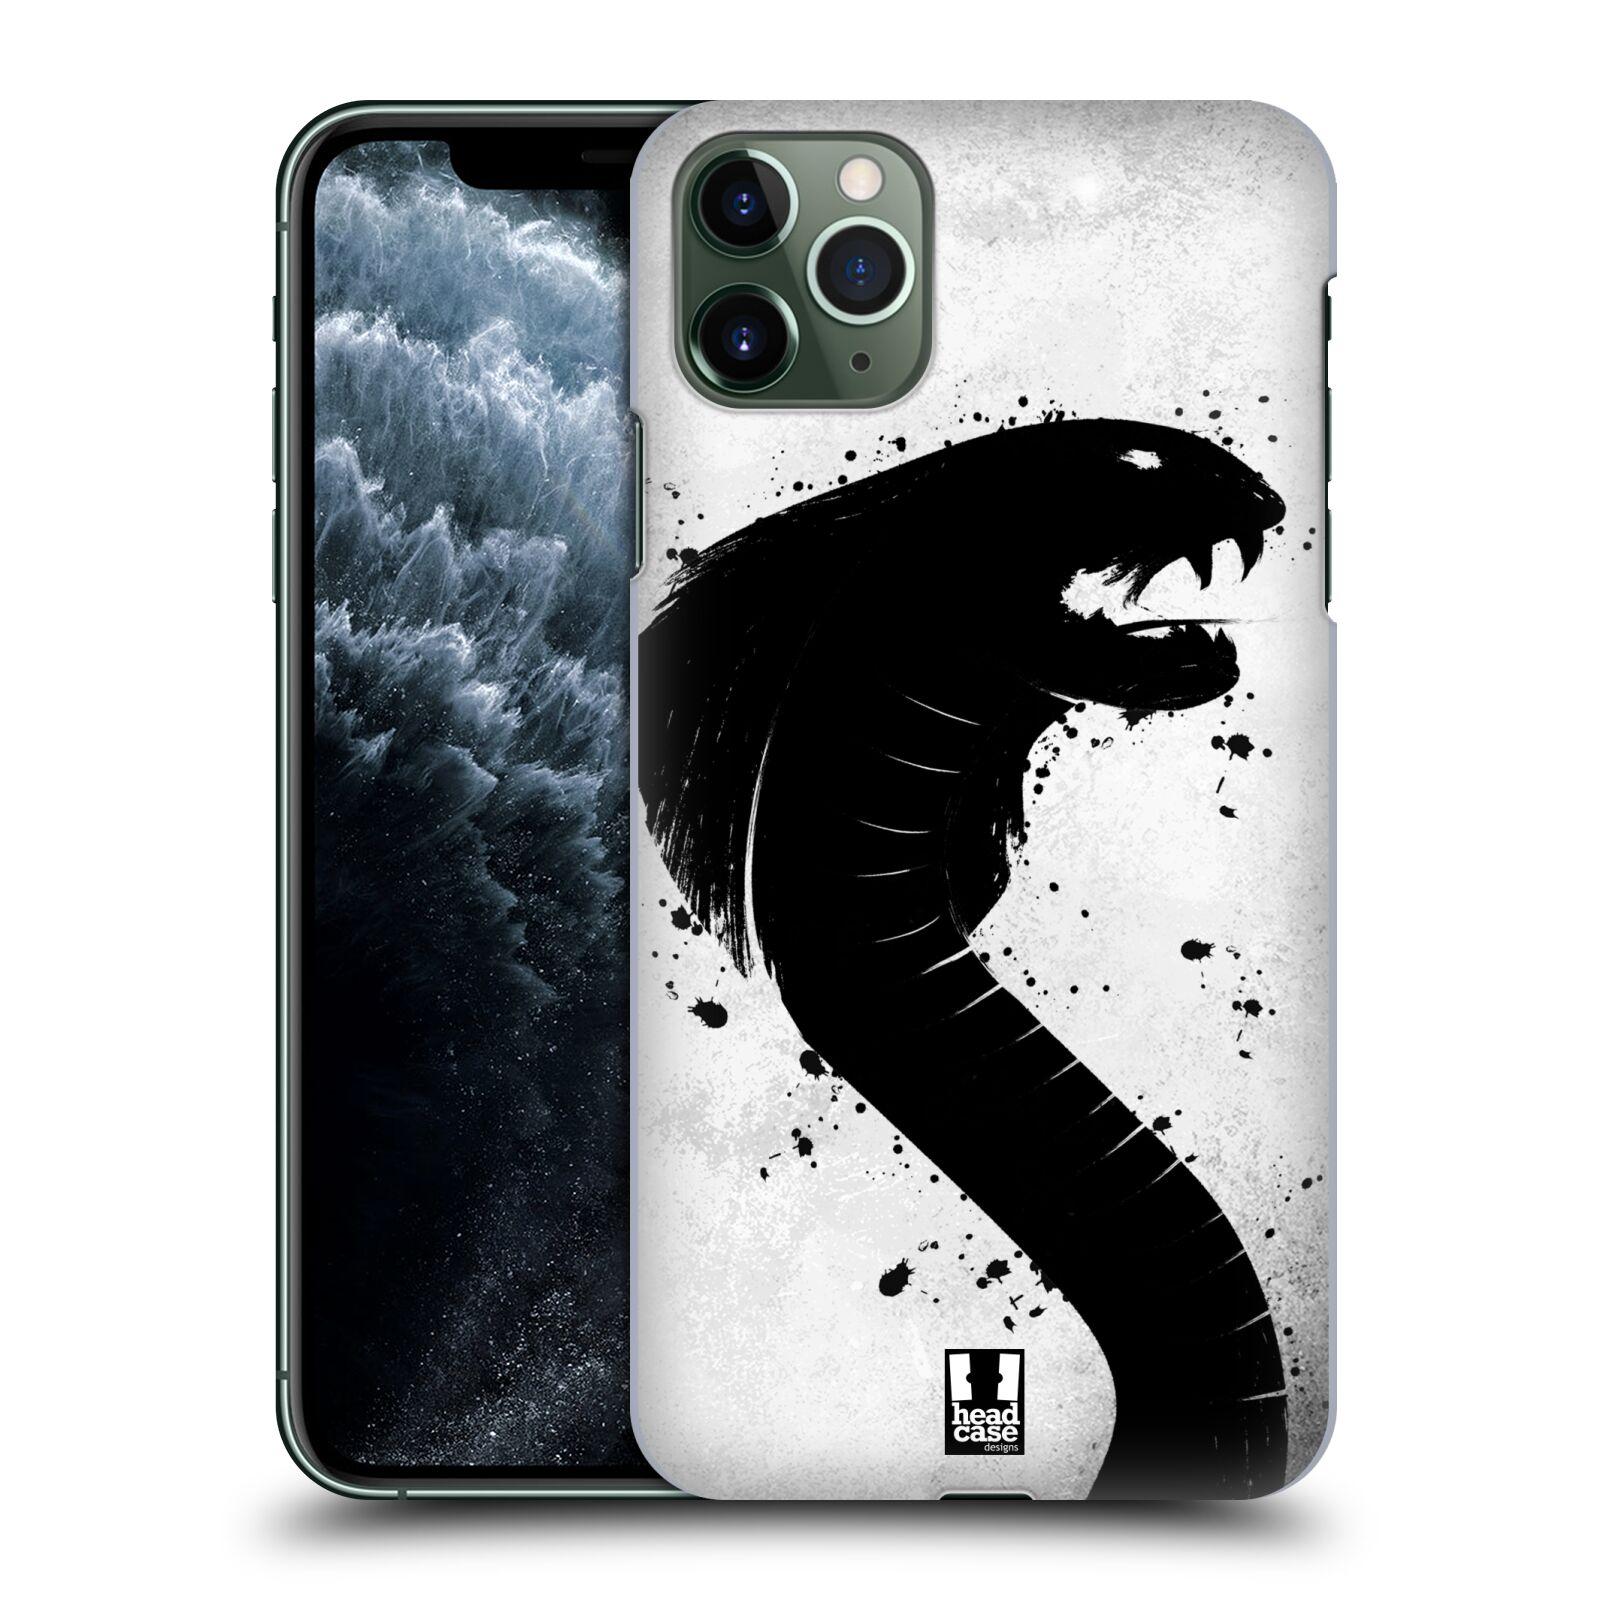 Pouzdro na mobil Apple Iphone 11 PRO MAX - HEAD CASE - vzor Kresba tuš zvíře had kobra